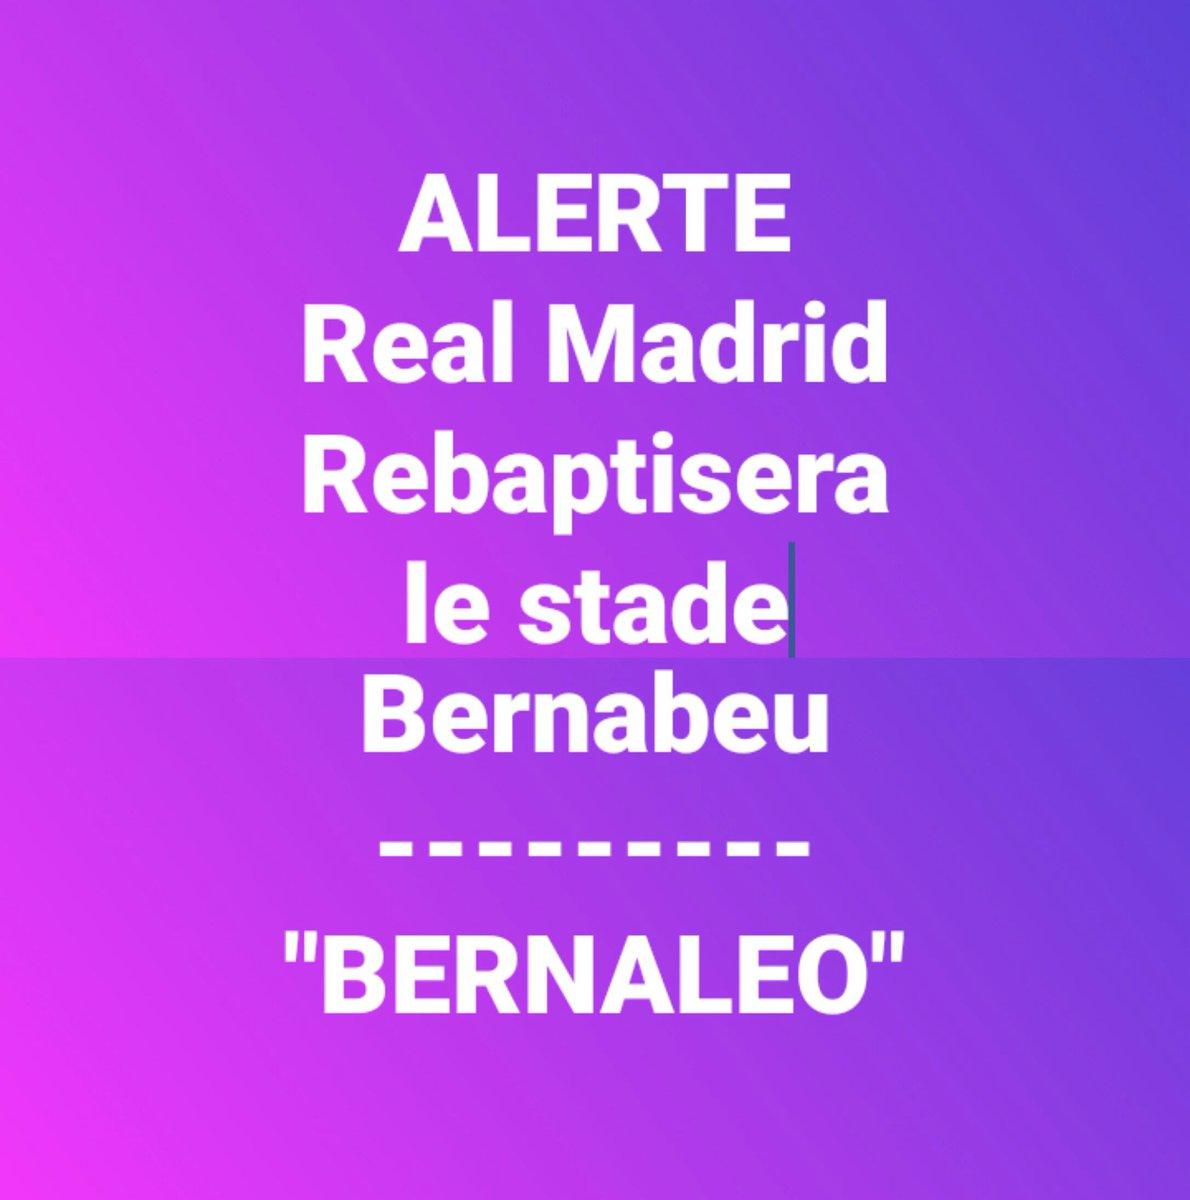 #Alerte : le @realmadrid change le nom du #Bernabeu ! #RealBarca #BarcaReal